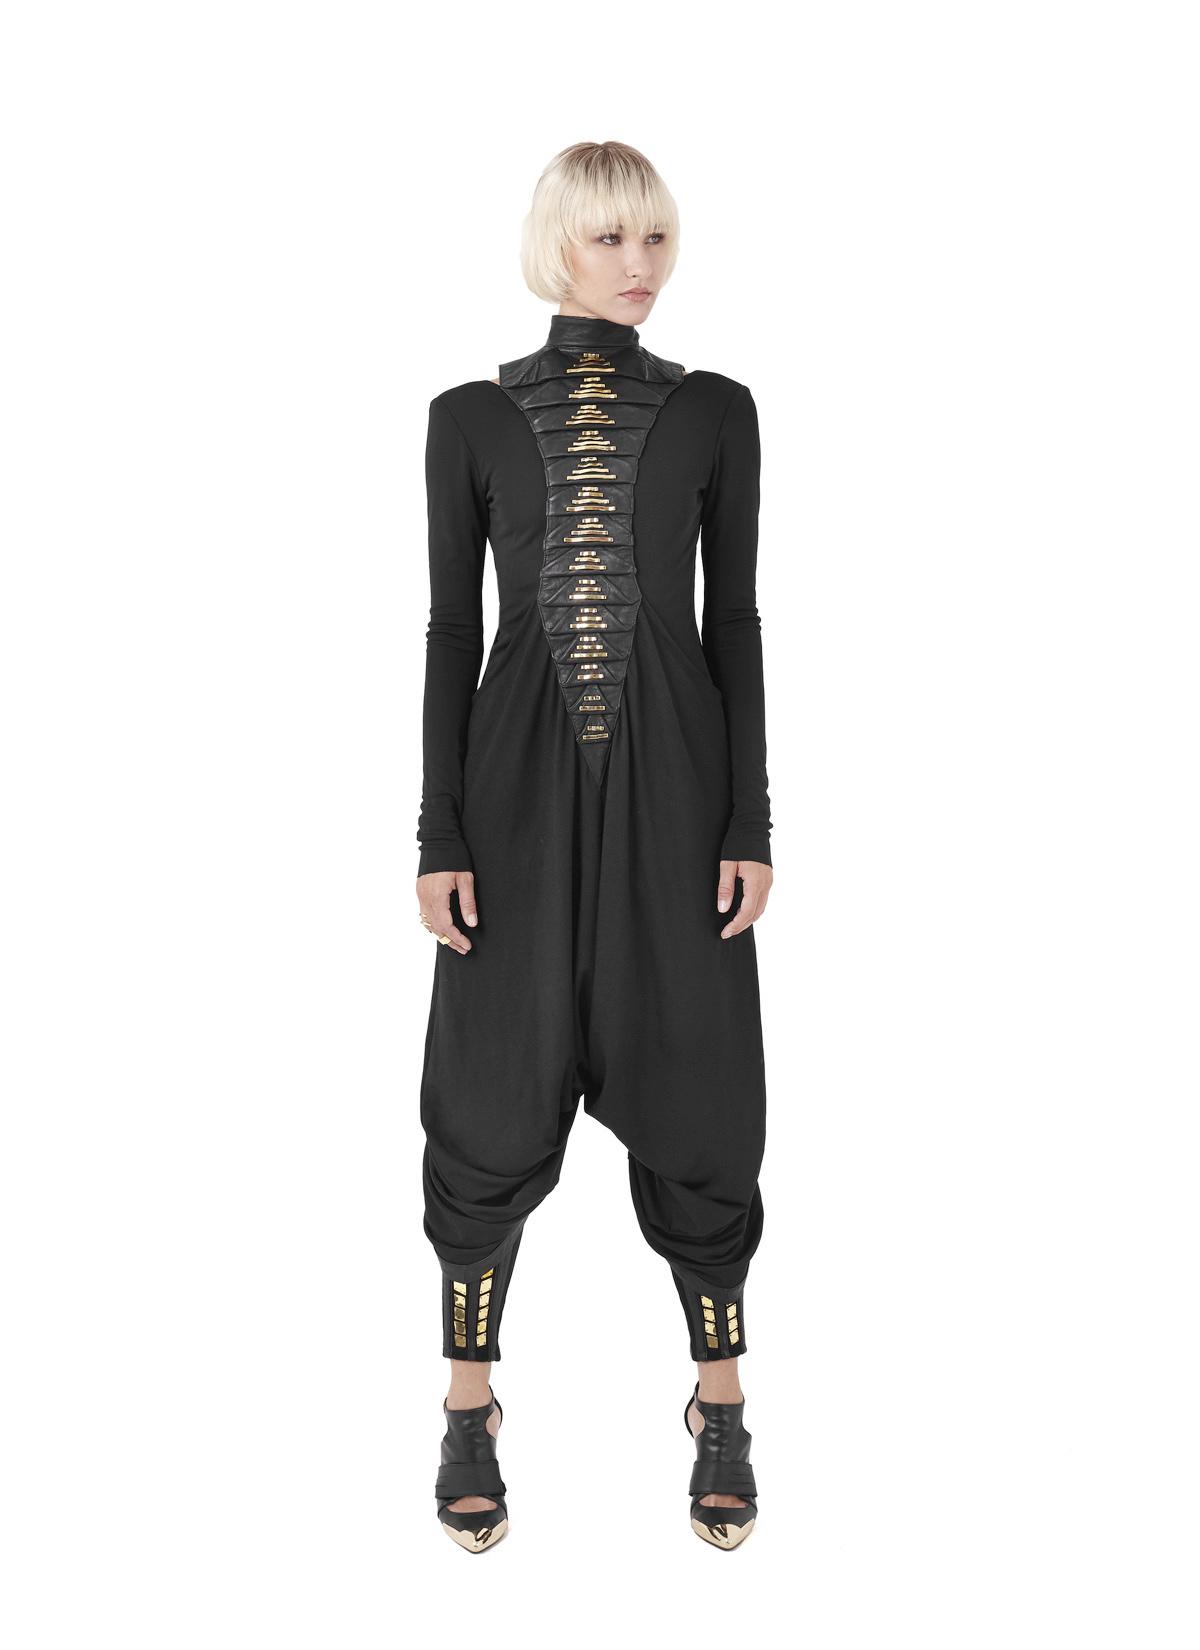 Sillias robe, Scoria dress & Diamond pants